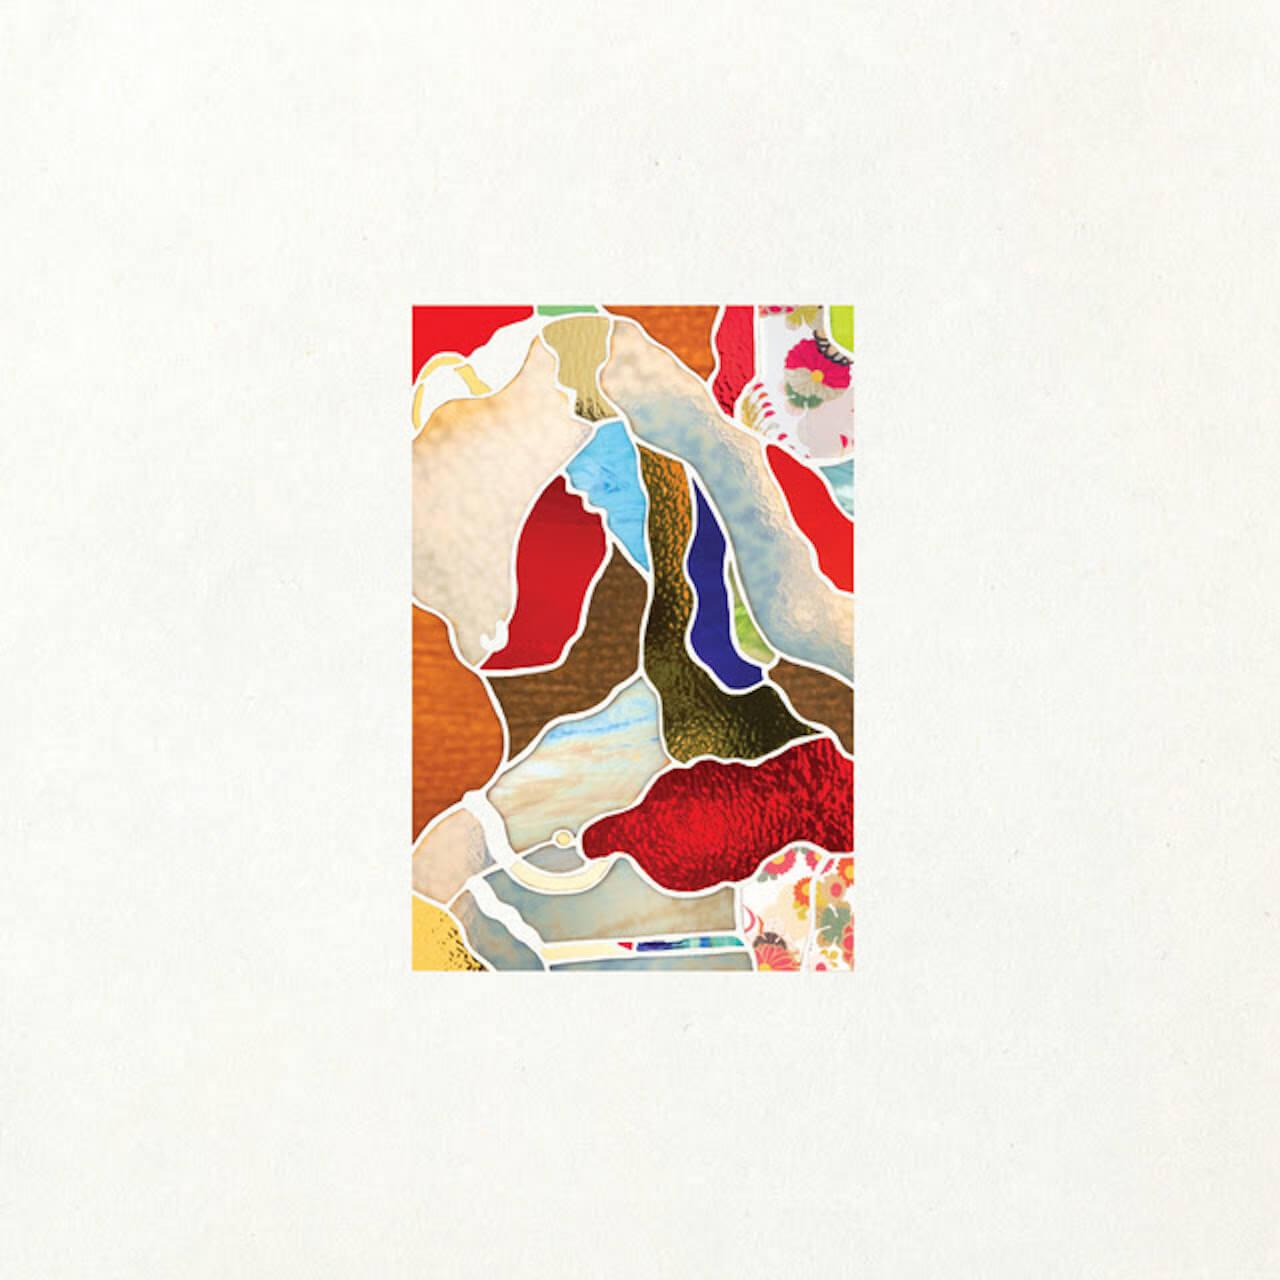 〈Brainfeeder〉からTeebsが最新作『Anicca』を10月にリリース|パンダ・ベア参加曲「Studie」と「Mirror Memory」を先行公開 music190919-teebs-1